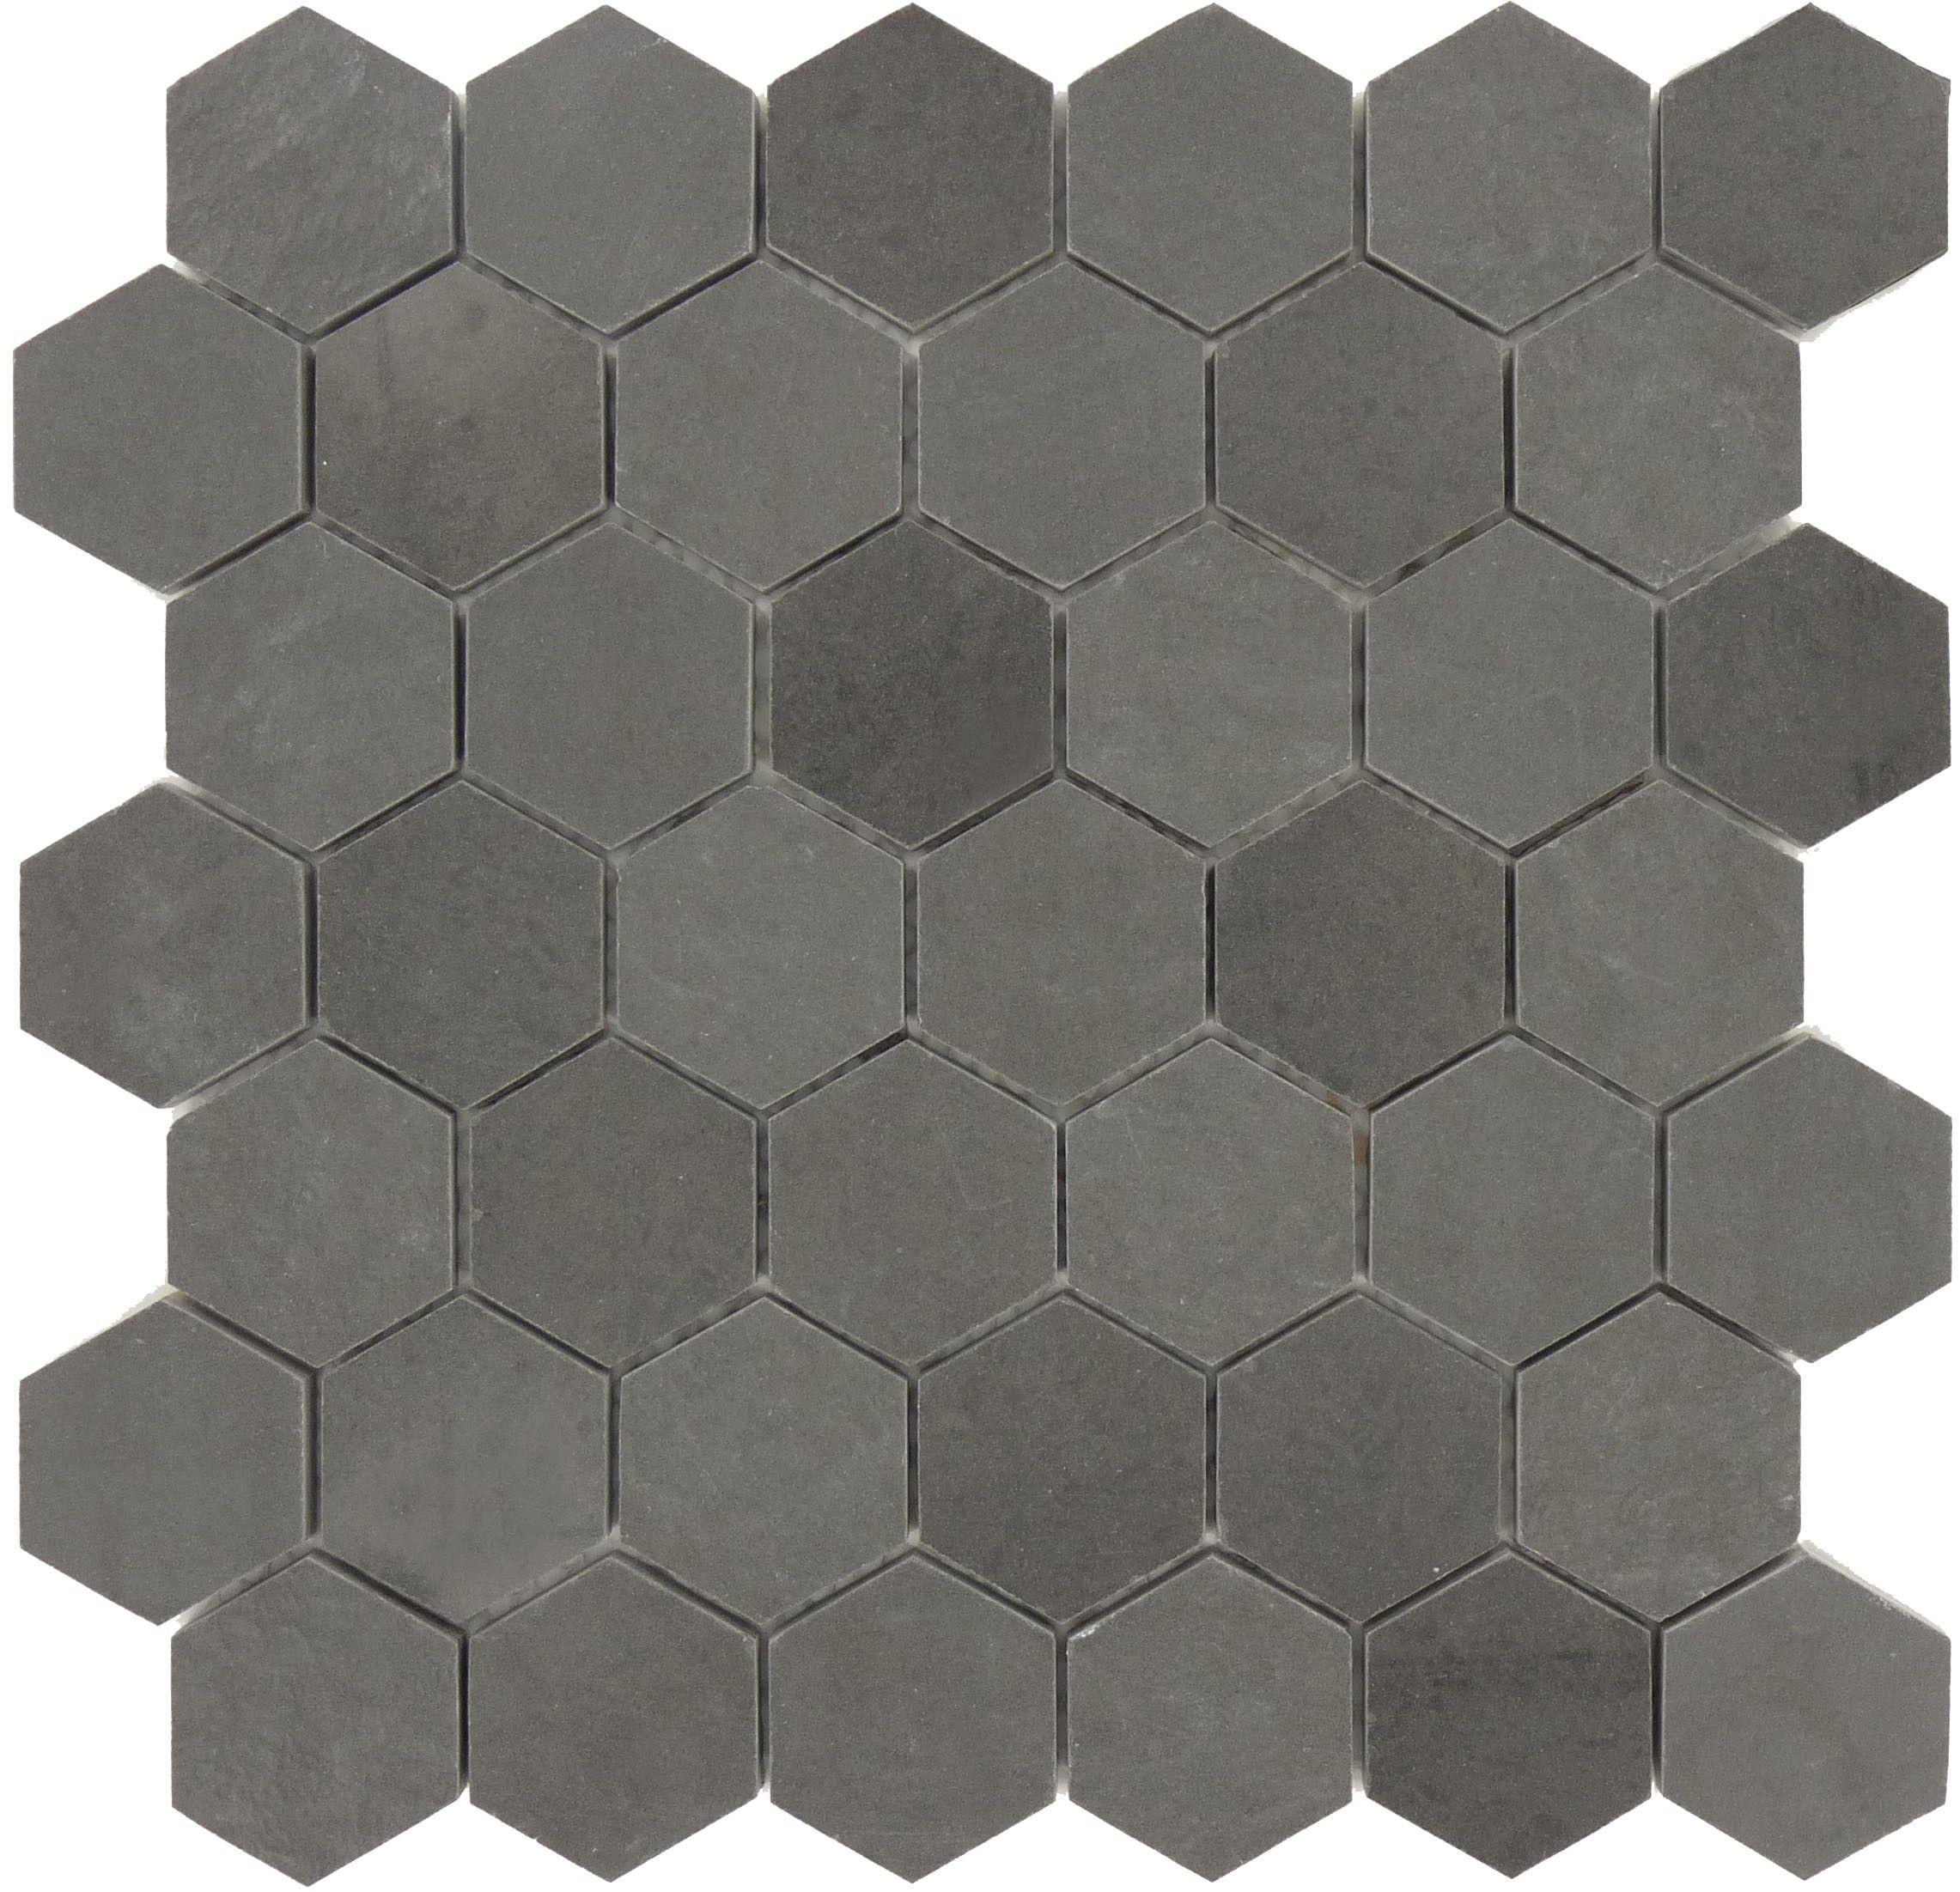 Sheet Size 11 3 4 X 12 Tile Size 1 7 8 X 2 1 8 Tile Thickness 1 4 Nominal Grout Join Glass Mosaic Tile Backsplash Glass Mosaic Tiles Tiles